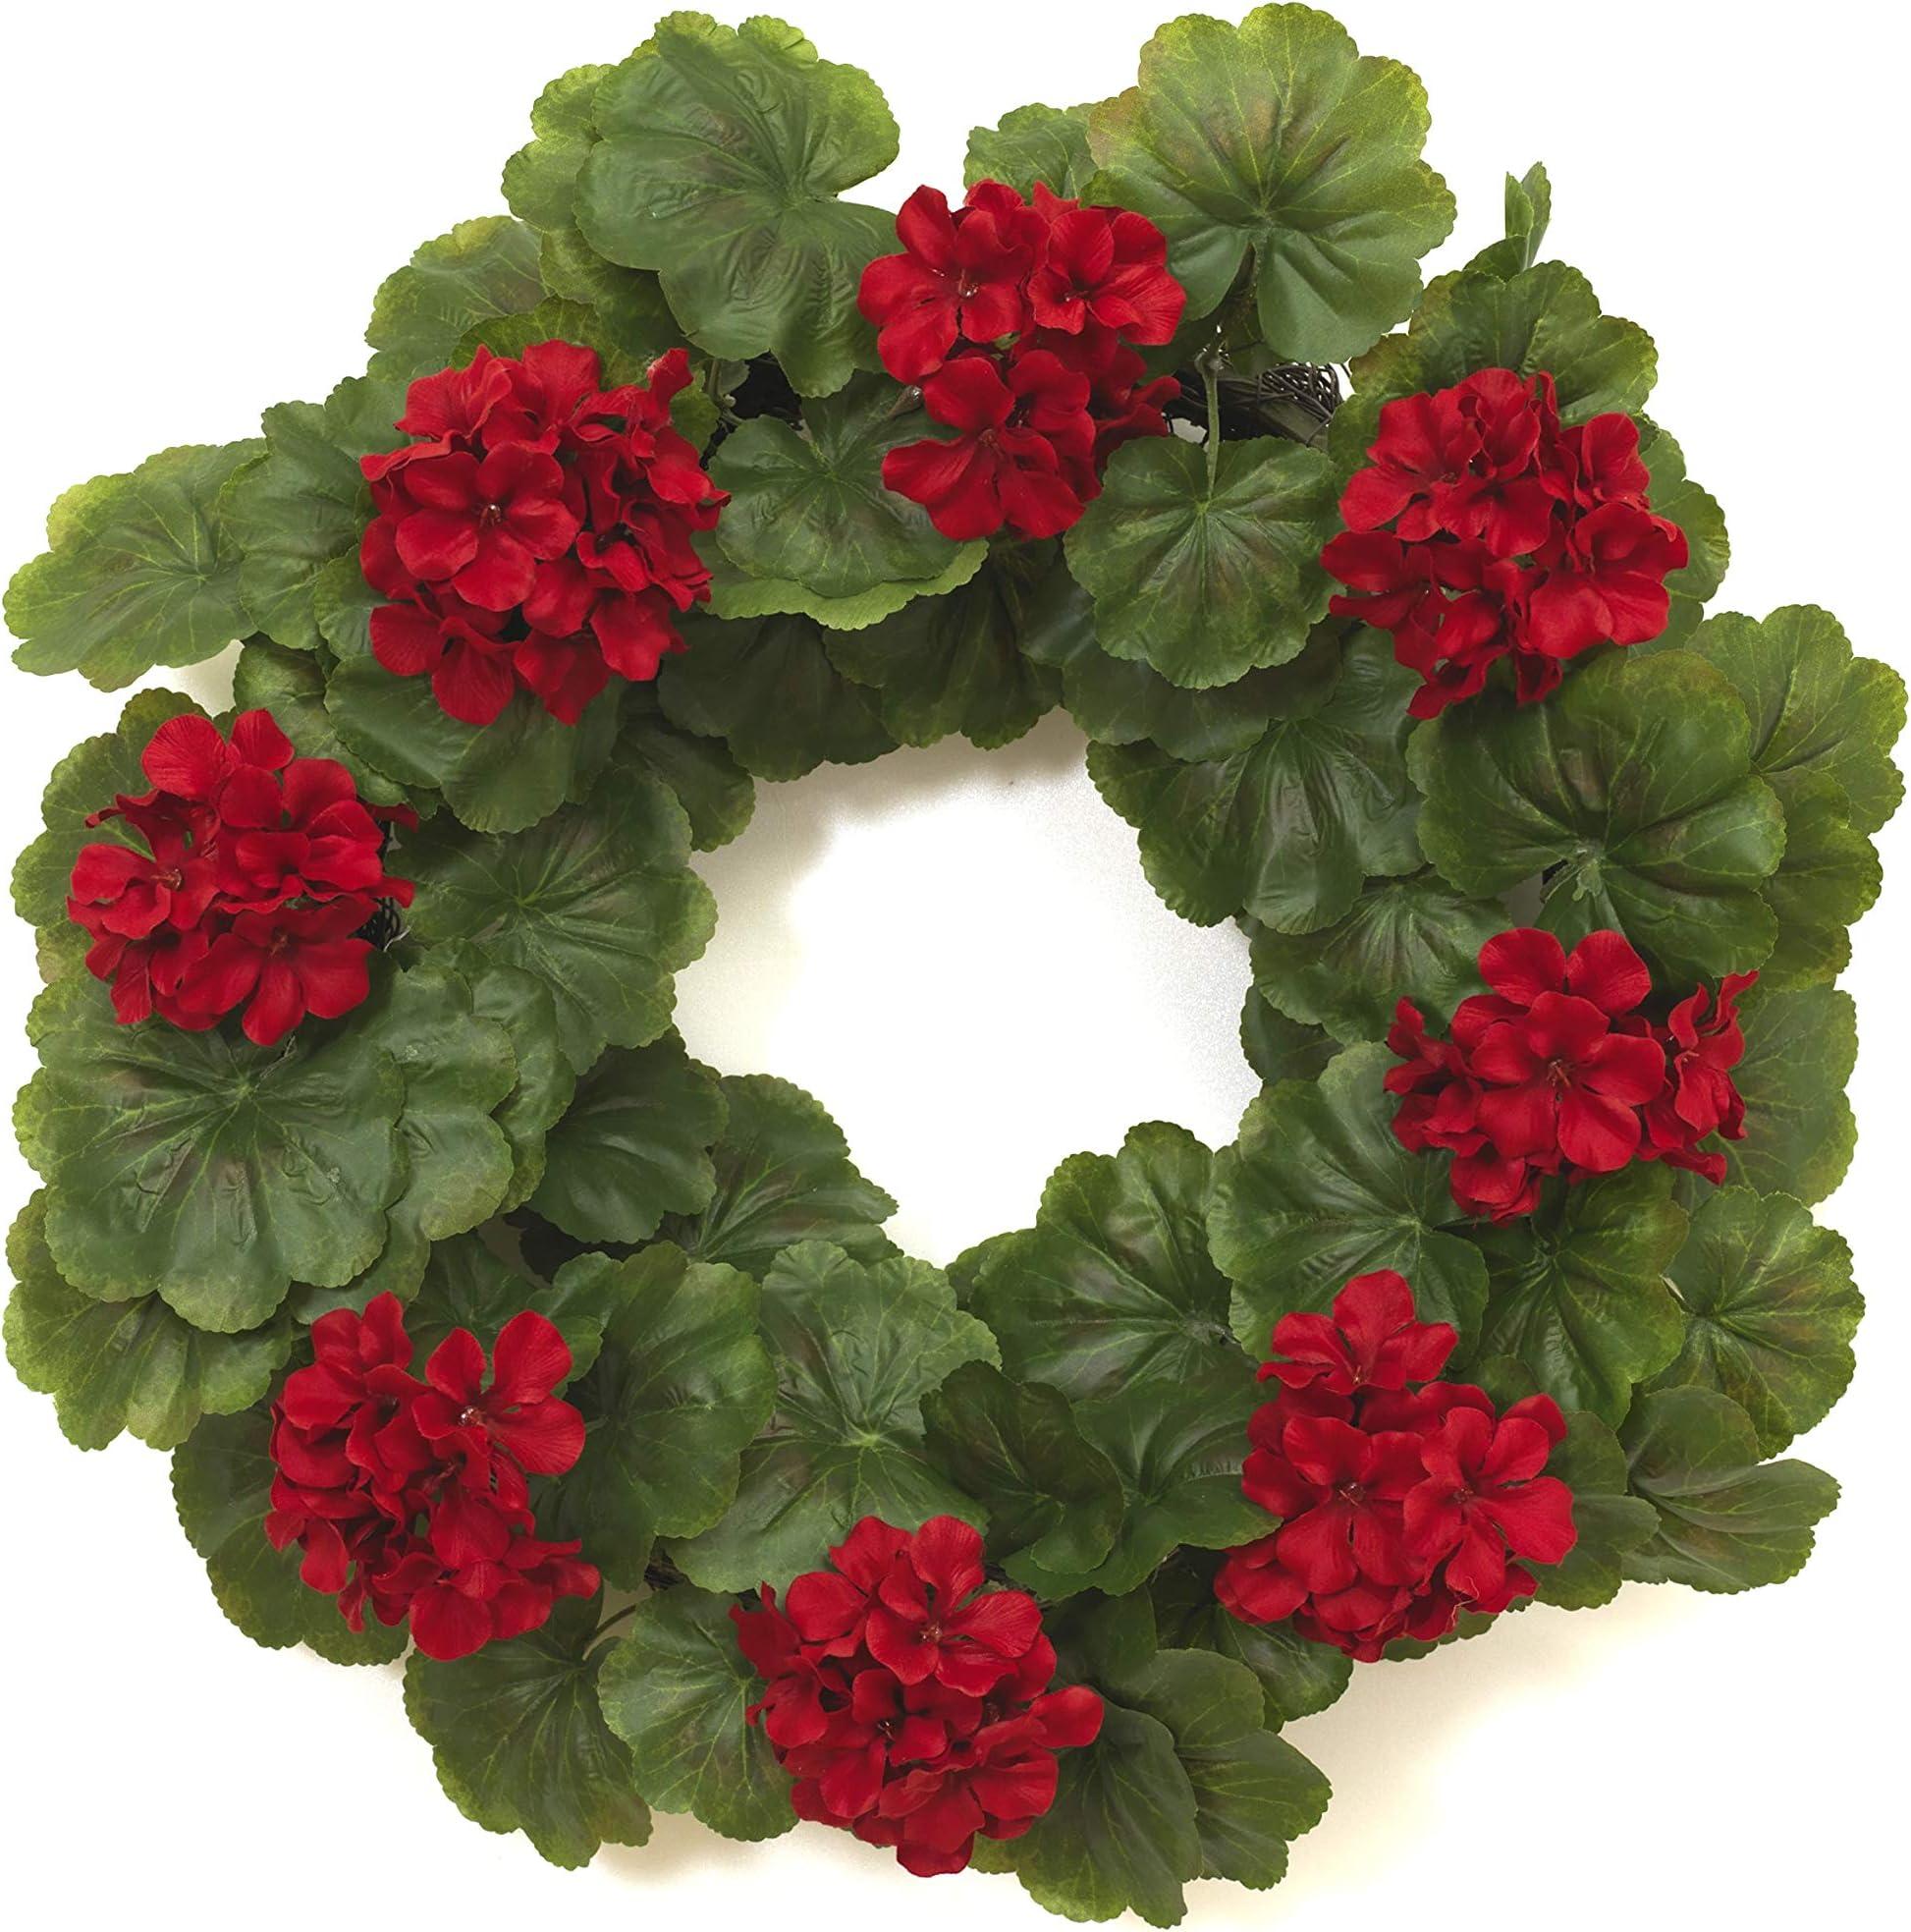 Front Door Wreath Mantle Wreath Patio Wreath Diameter of Wreath is 20 Artificial Succulent Wreath on 18 Natural Grapevine Base